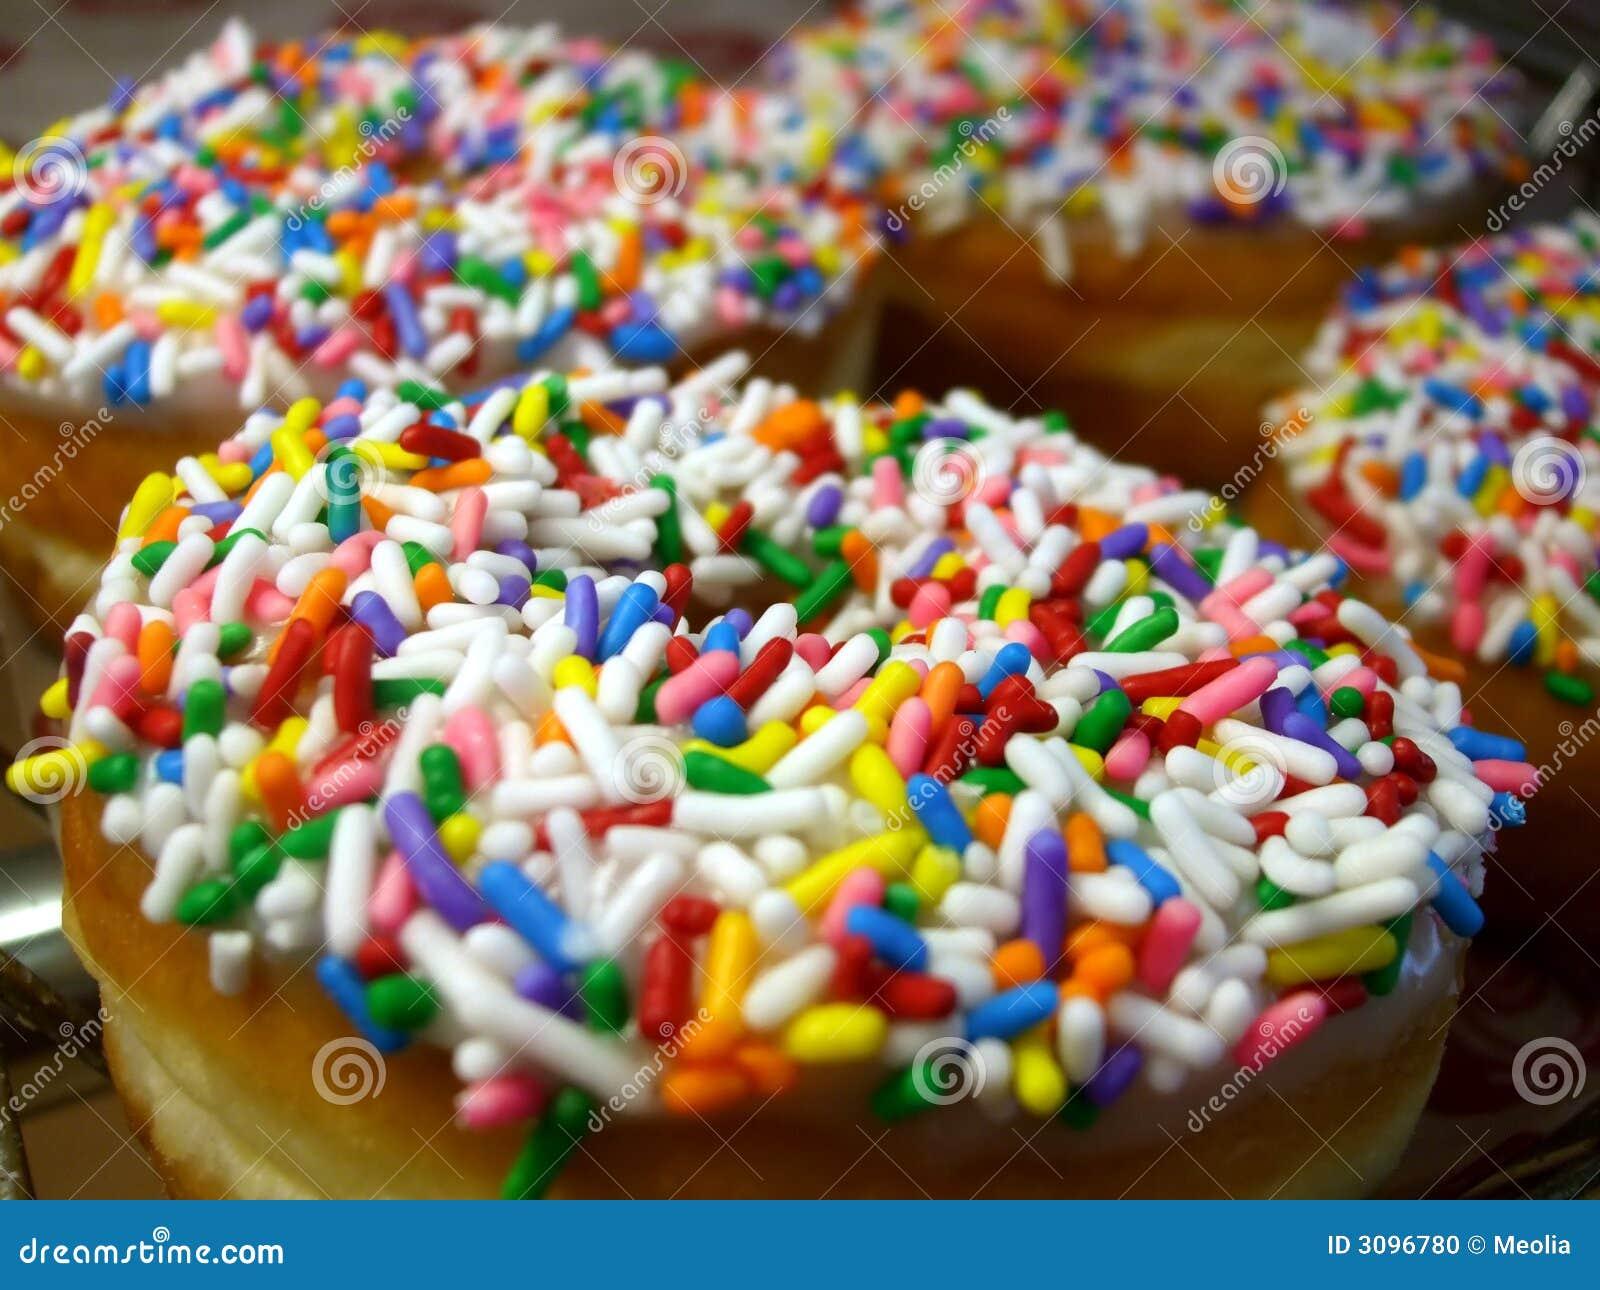 Sprinkled Donut Stock Photo - Image: 3096780   1300 x 1065 jpeg 194kB